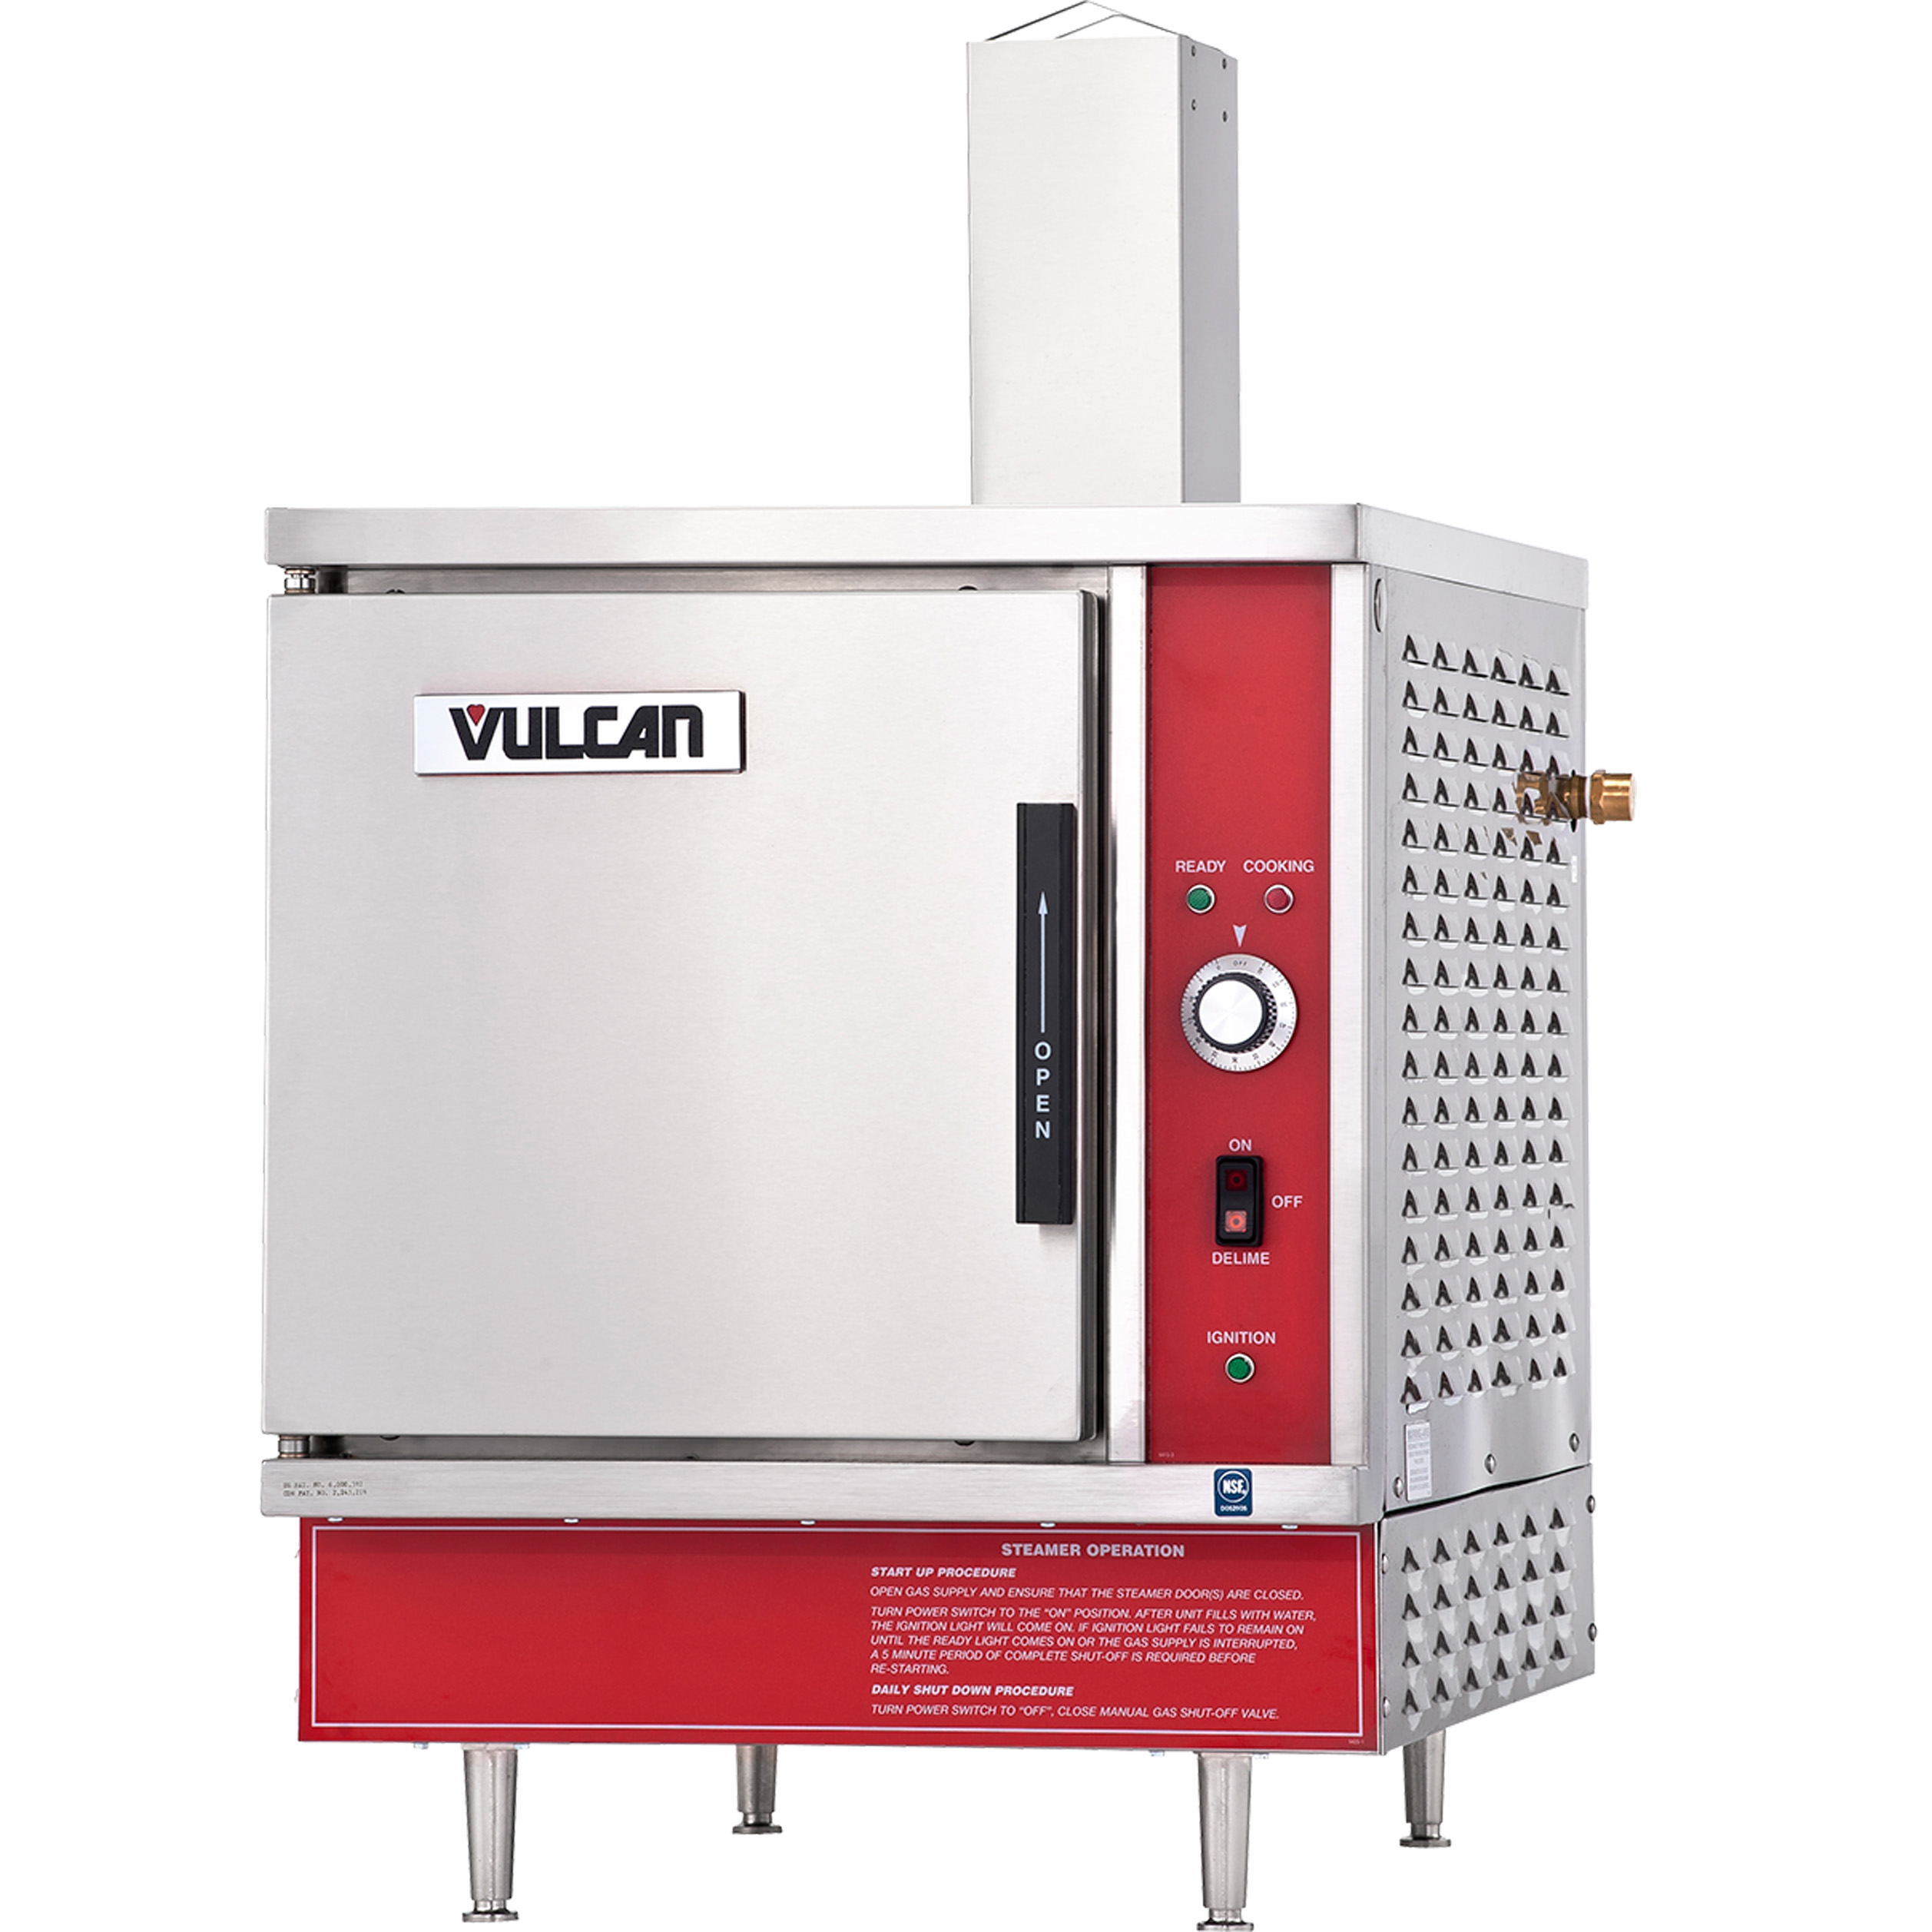 Vulcan VSX5G steamer, convection, countertop